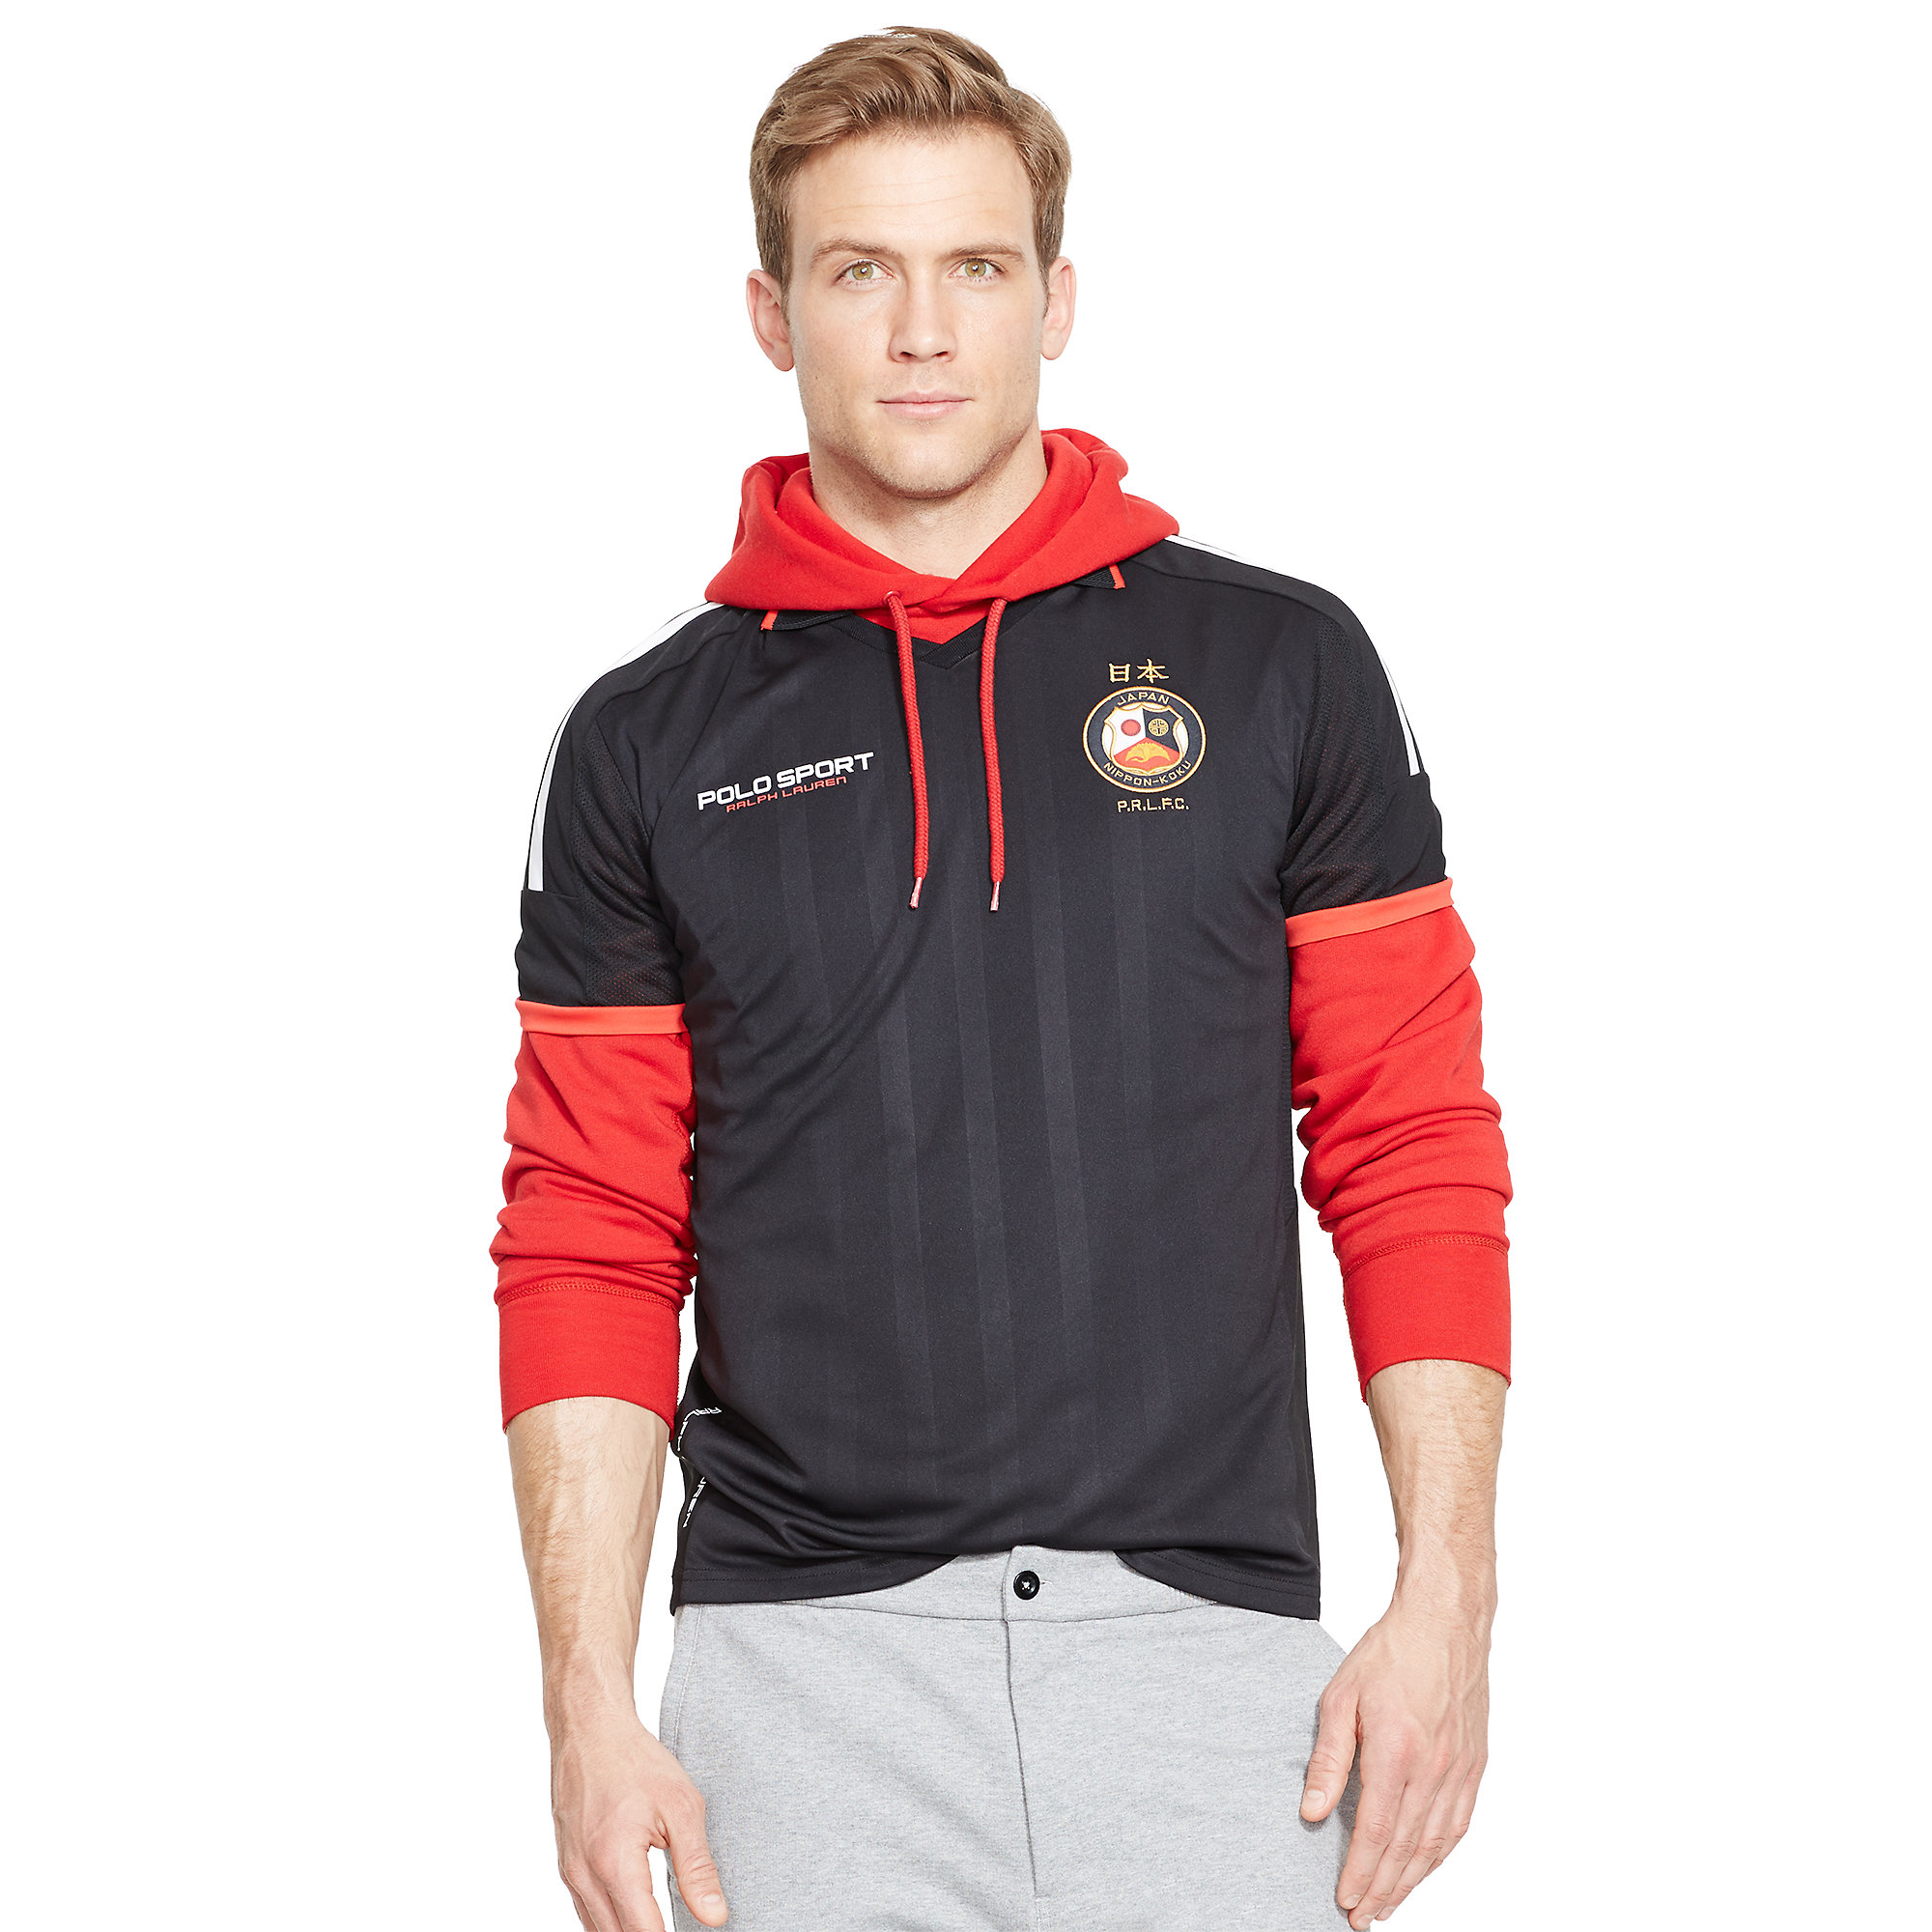 Ralph lauren japan jersey polo shirt in black for men lyst for Ralph lauren polo jersey shirt